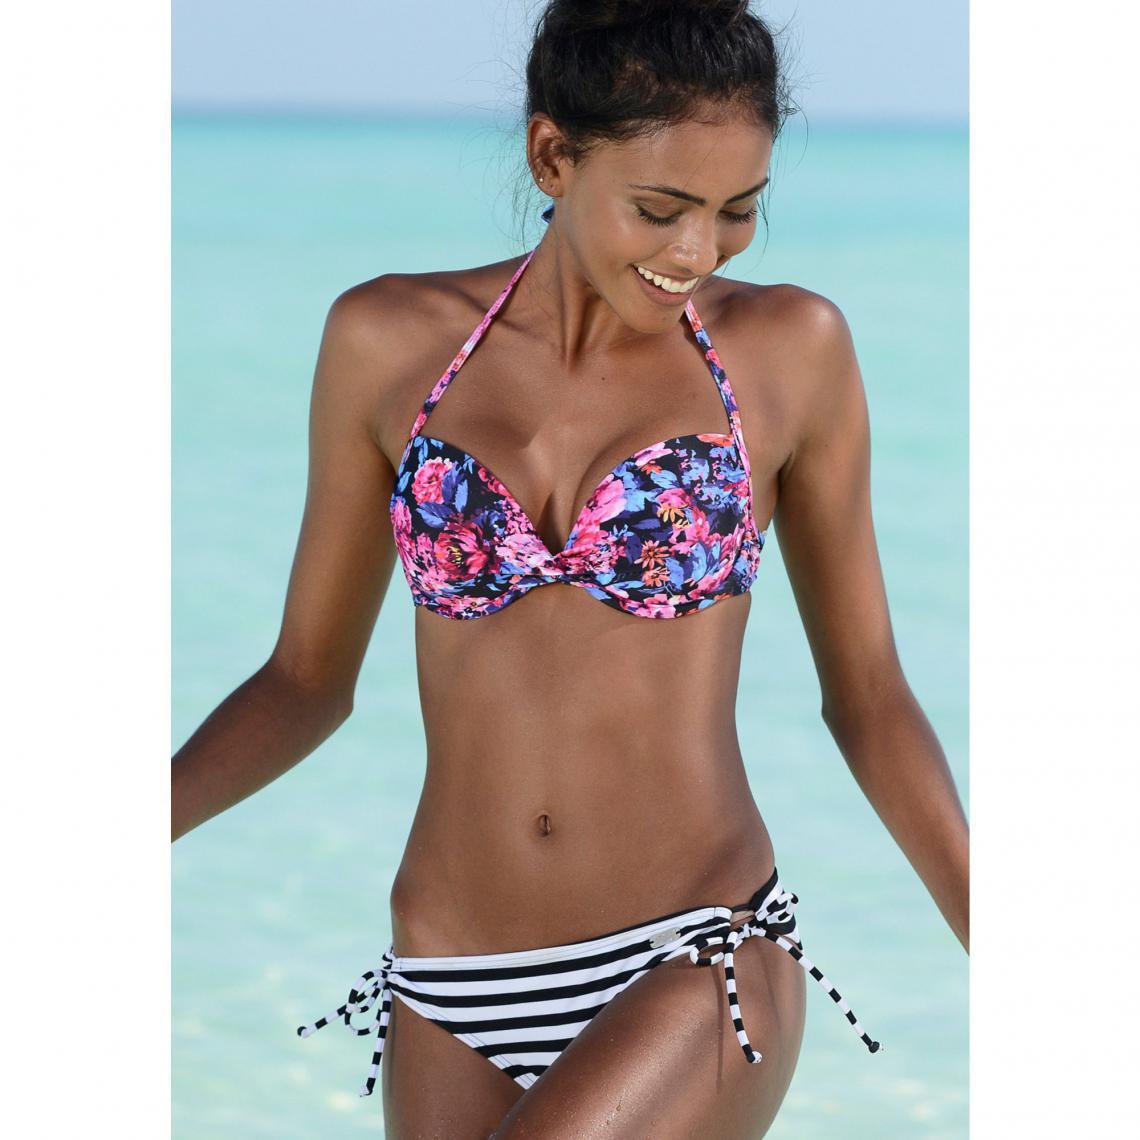 Soutien-gorge de maillot de bain push-up femme Buffalo - Noir Buffalo Femme 9fa38903a06